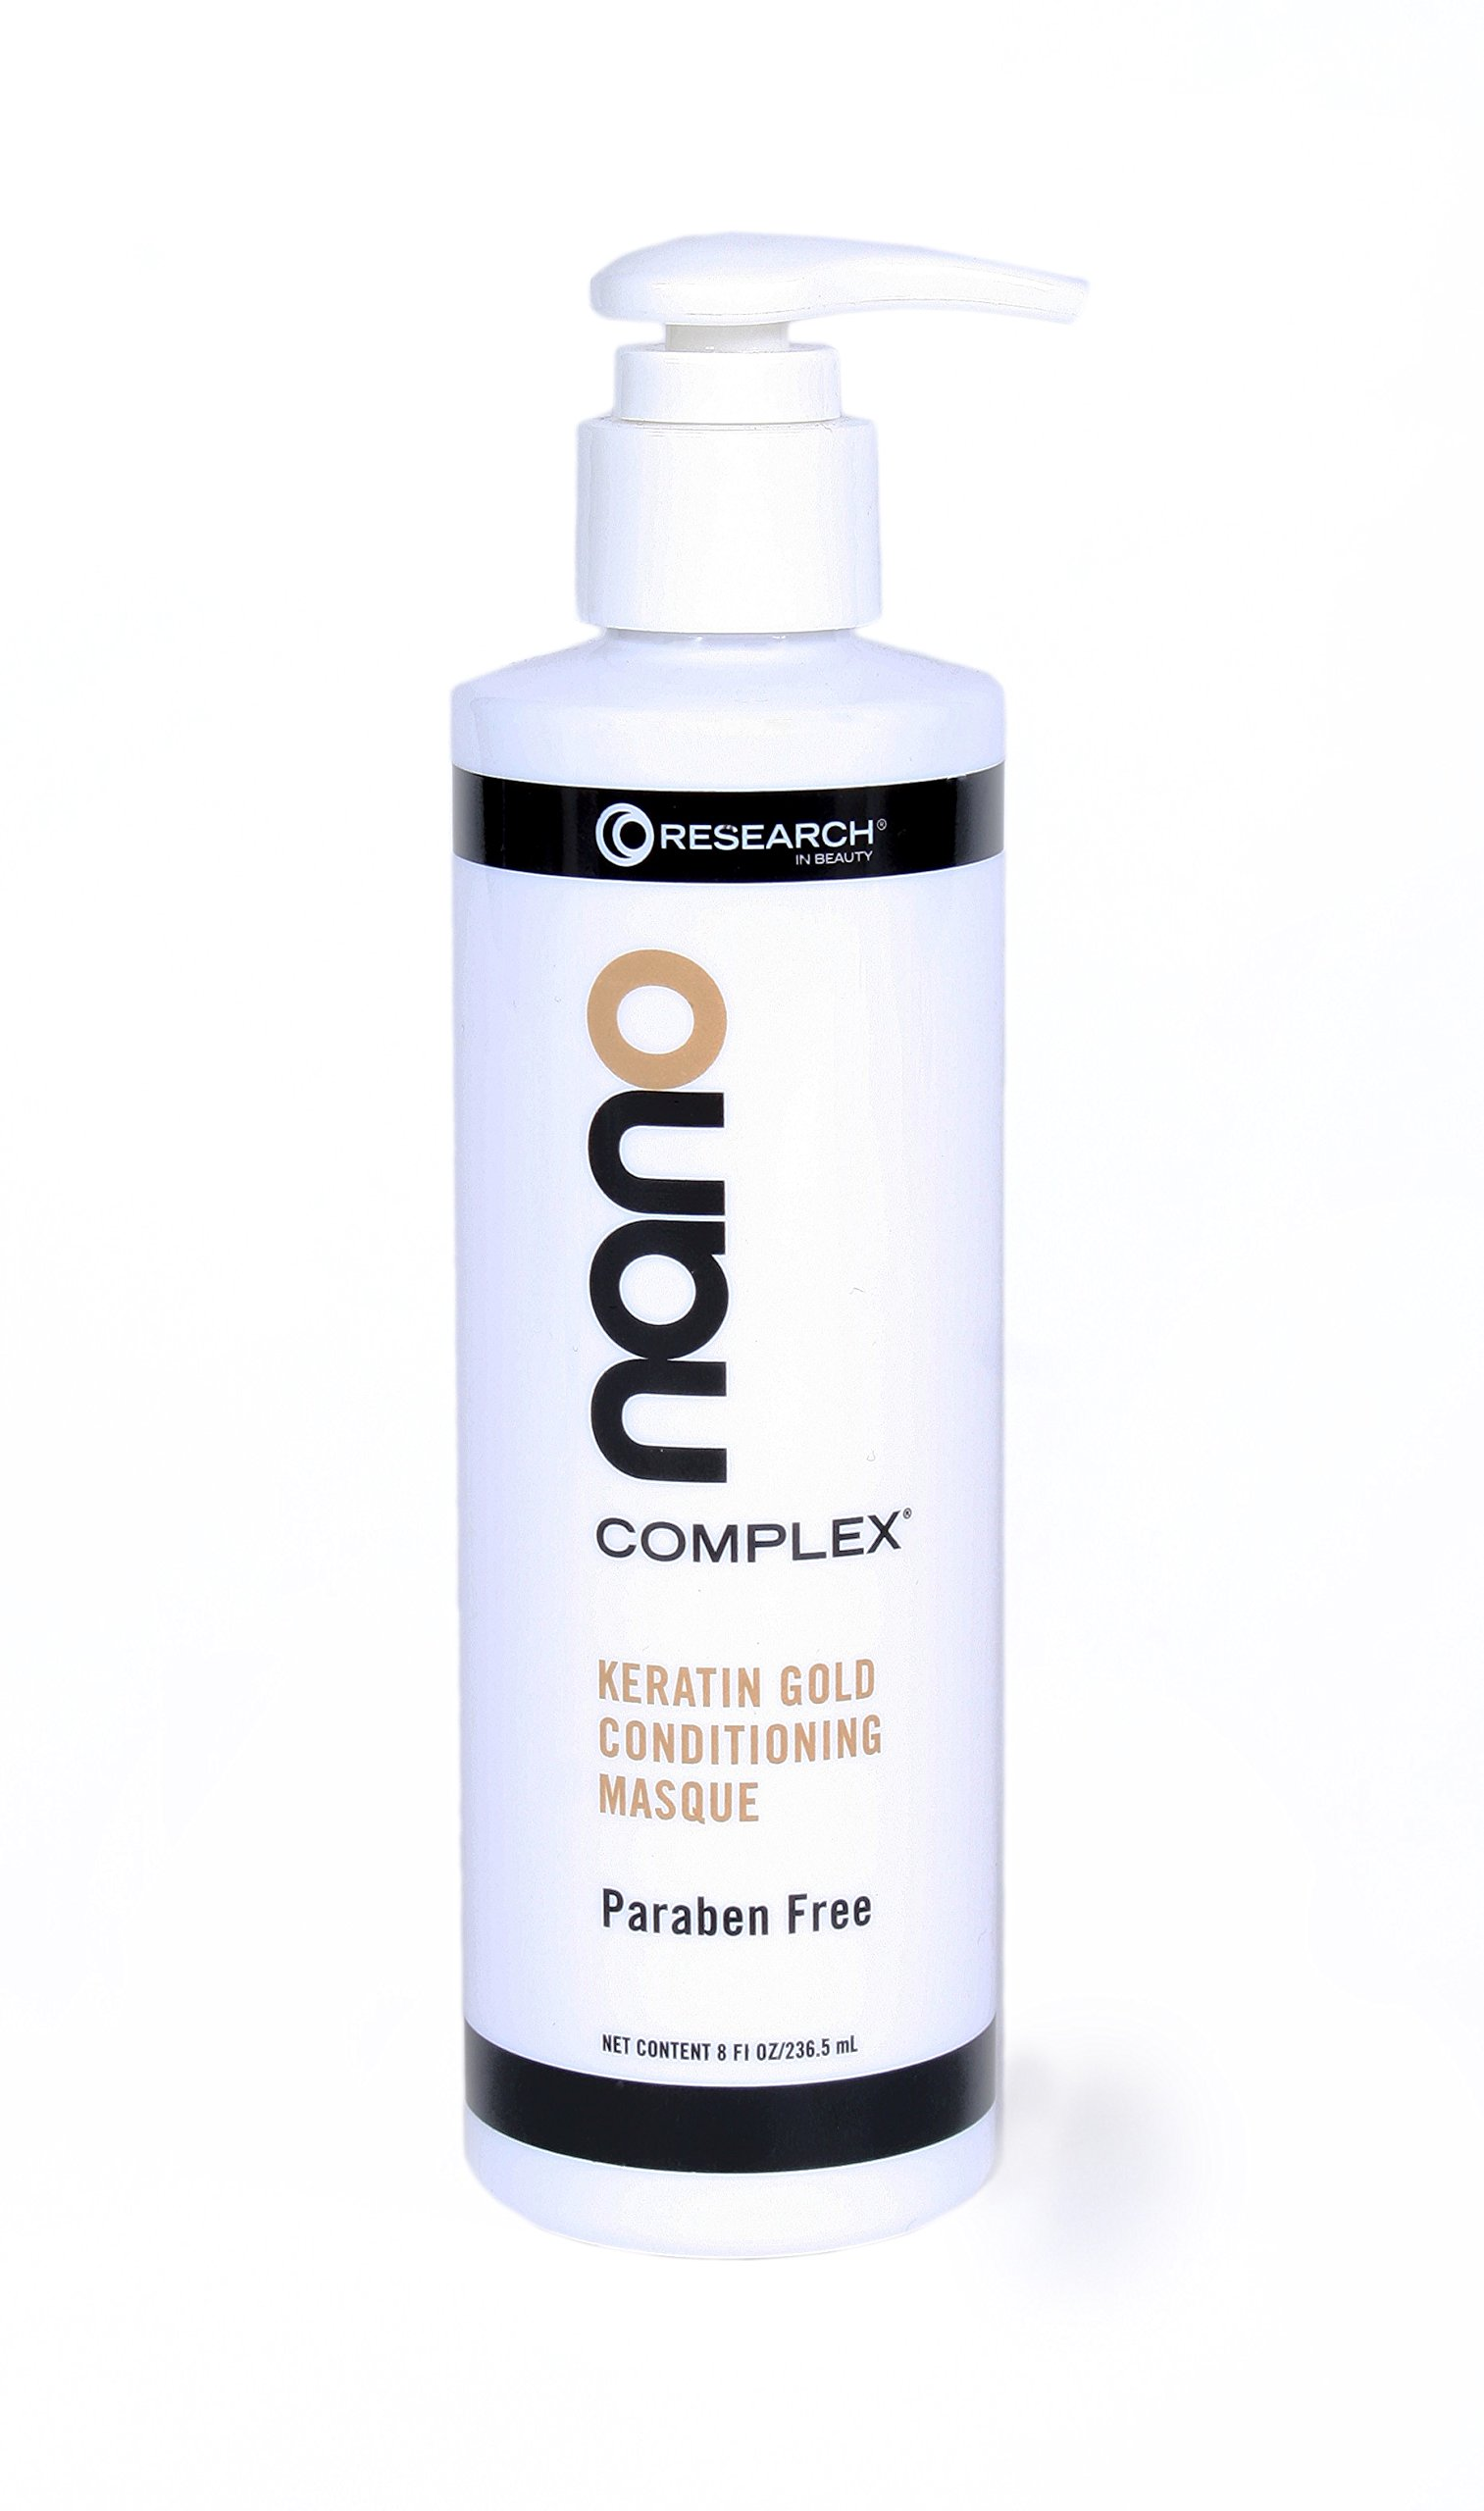 Research in Beauty Nano-Complex Keratin Gold Masque 8 Oz.